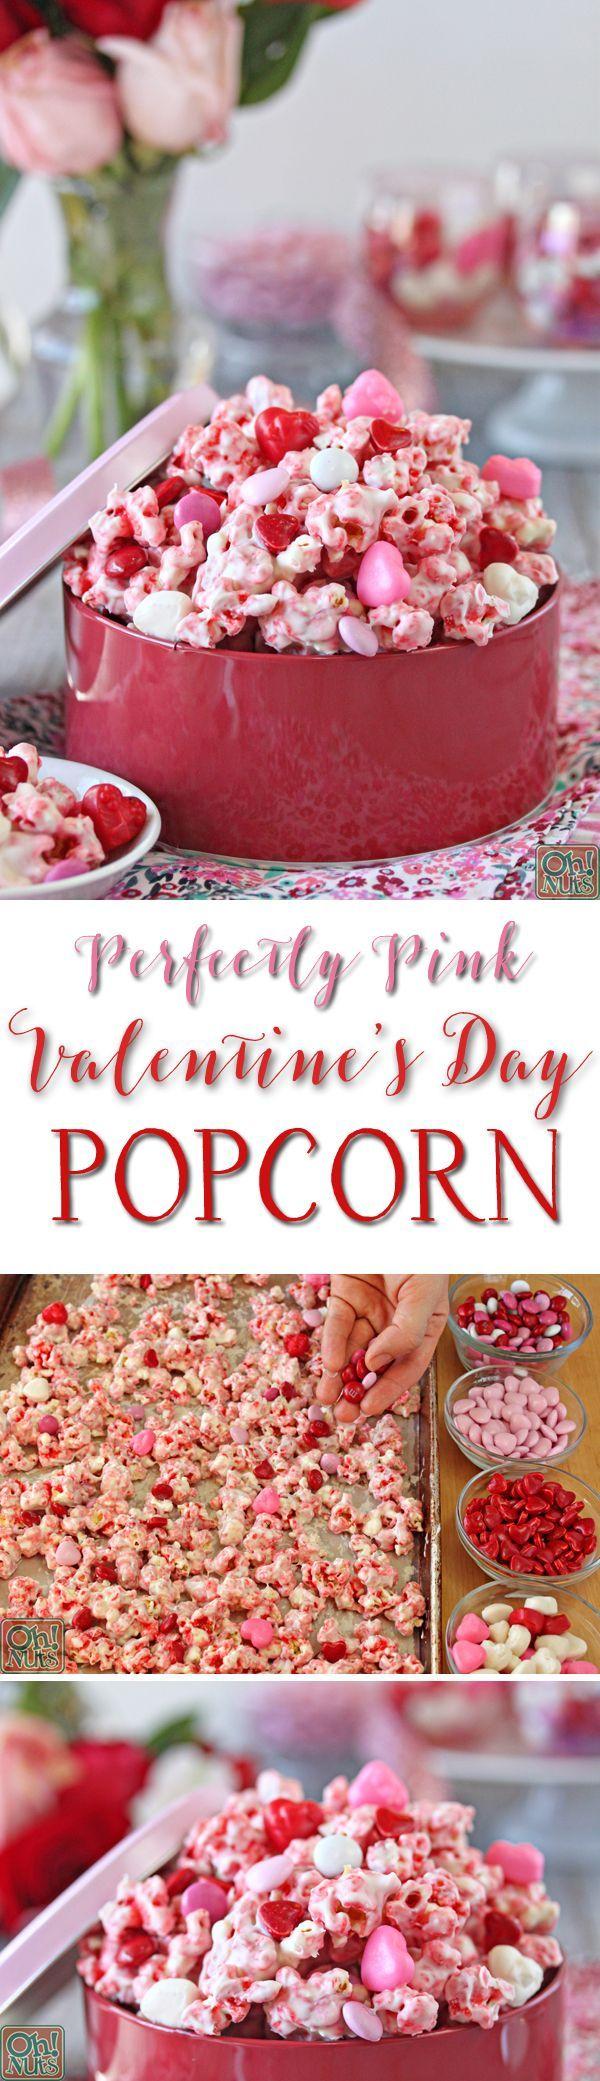 Perfectly Pink Valentine's Day Popcorn